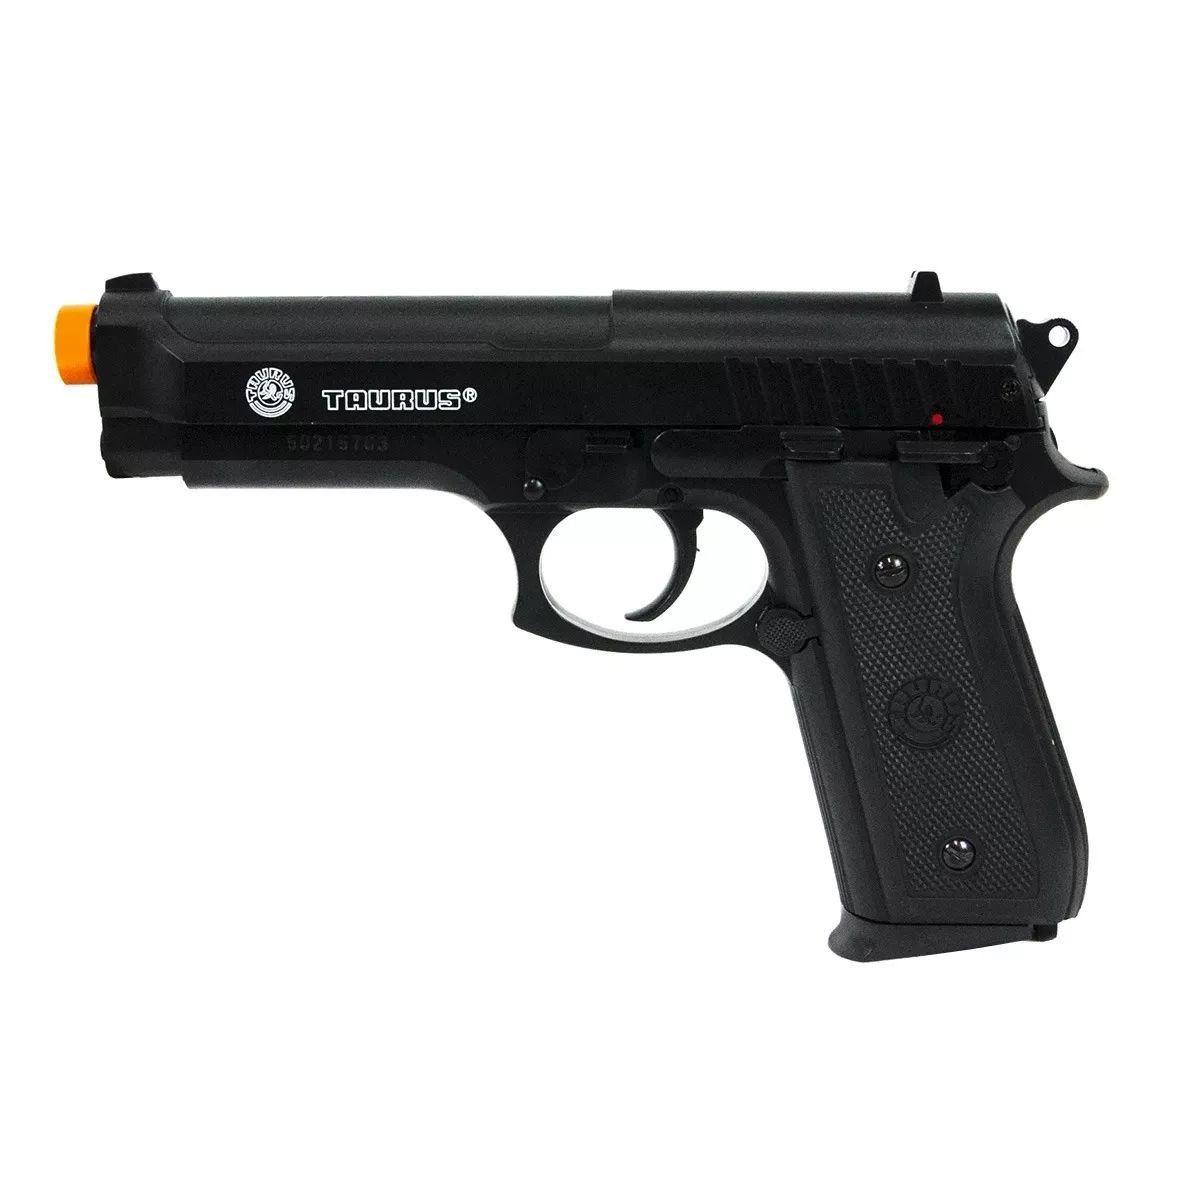 Pistola Airsoft Pt92 Slide Metal Spring